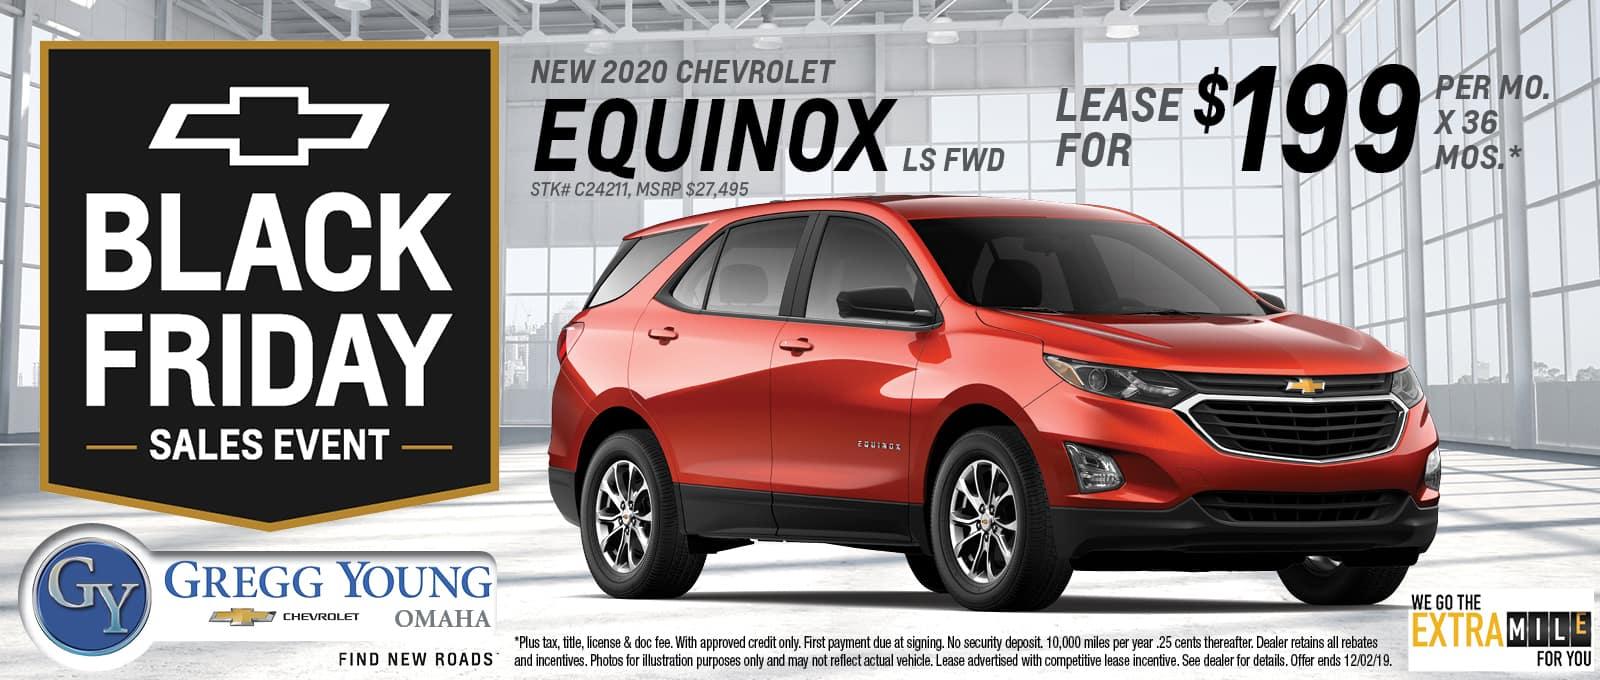 2020 Chevy Equinox LS